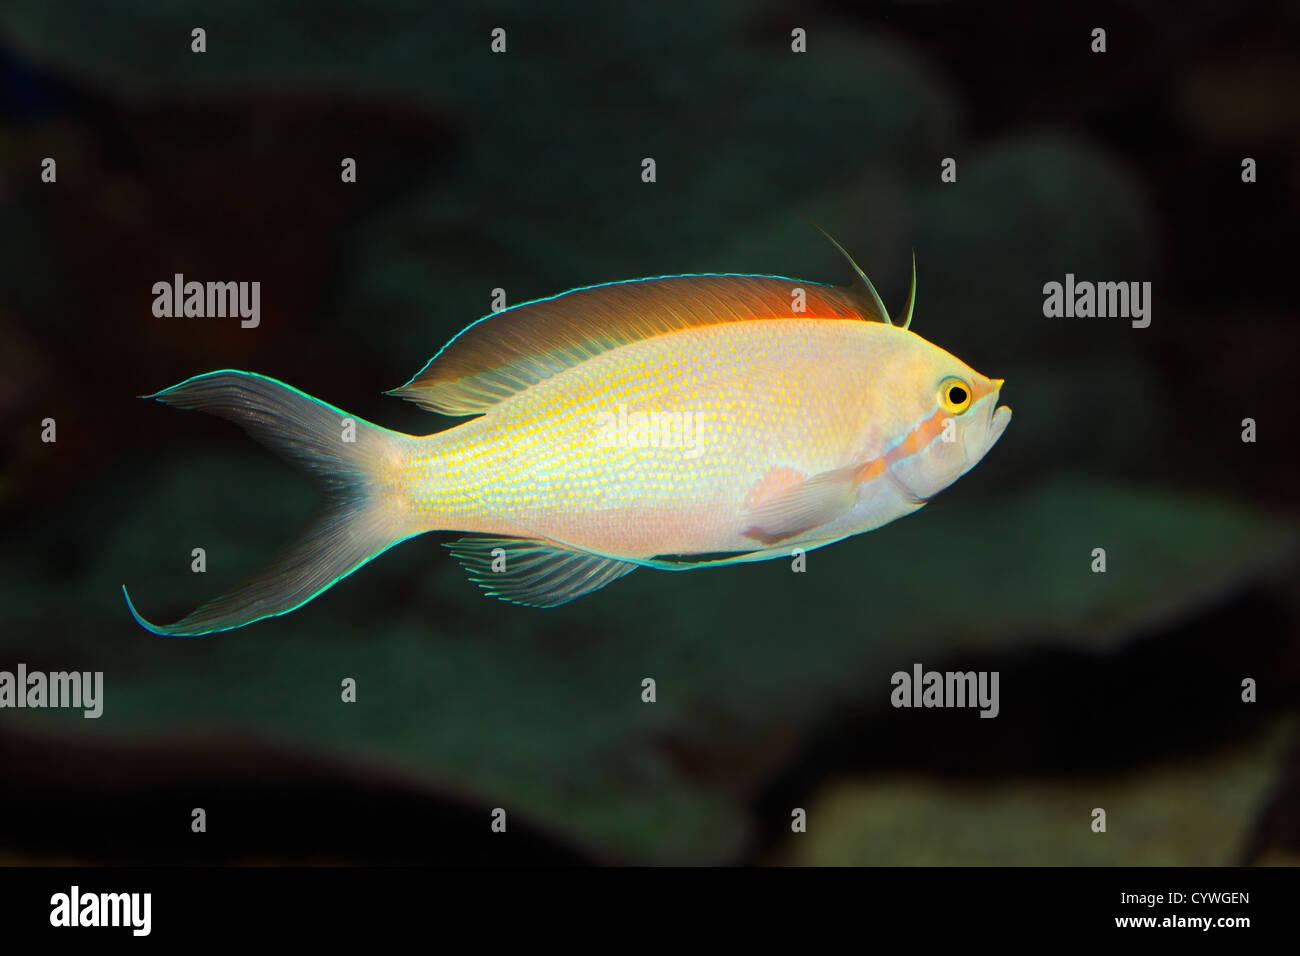 Underwater view of a colorful Anthias fish (Pseudanthias spp.) - Stock Image